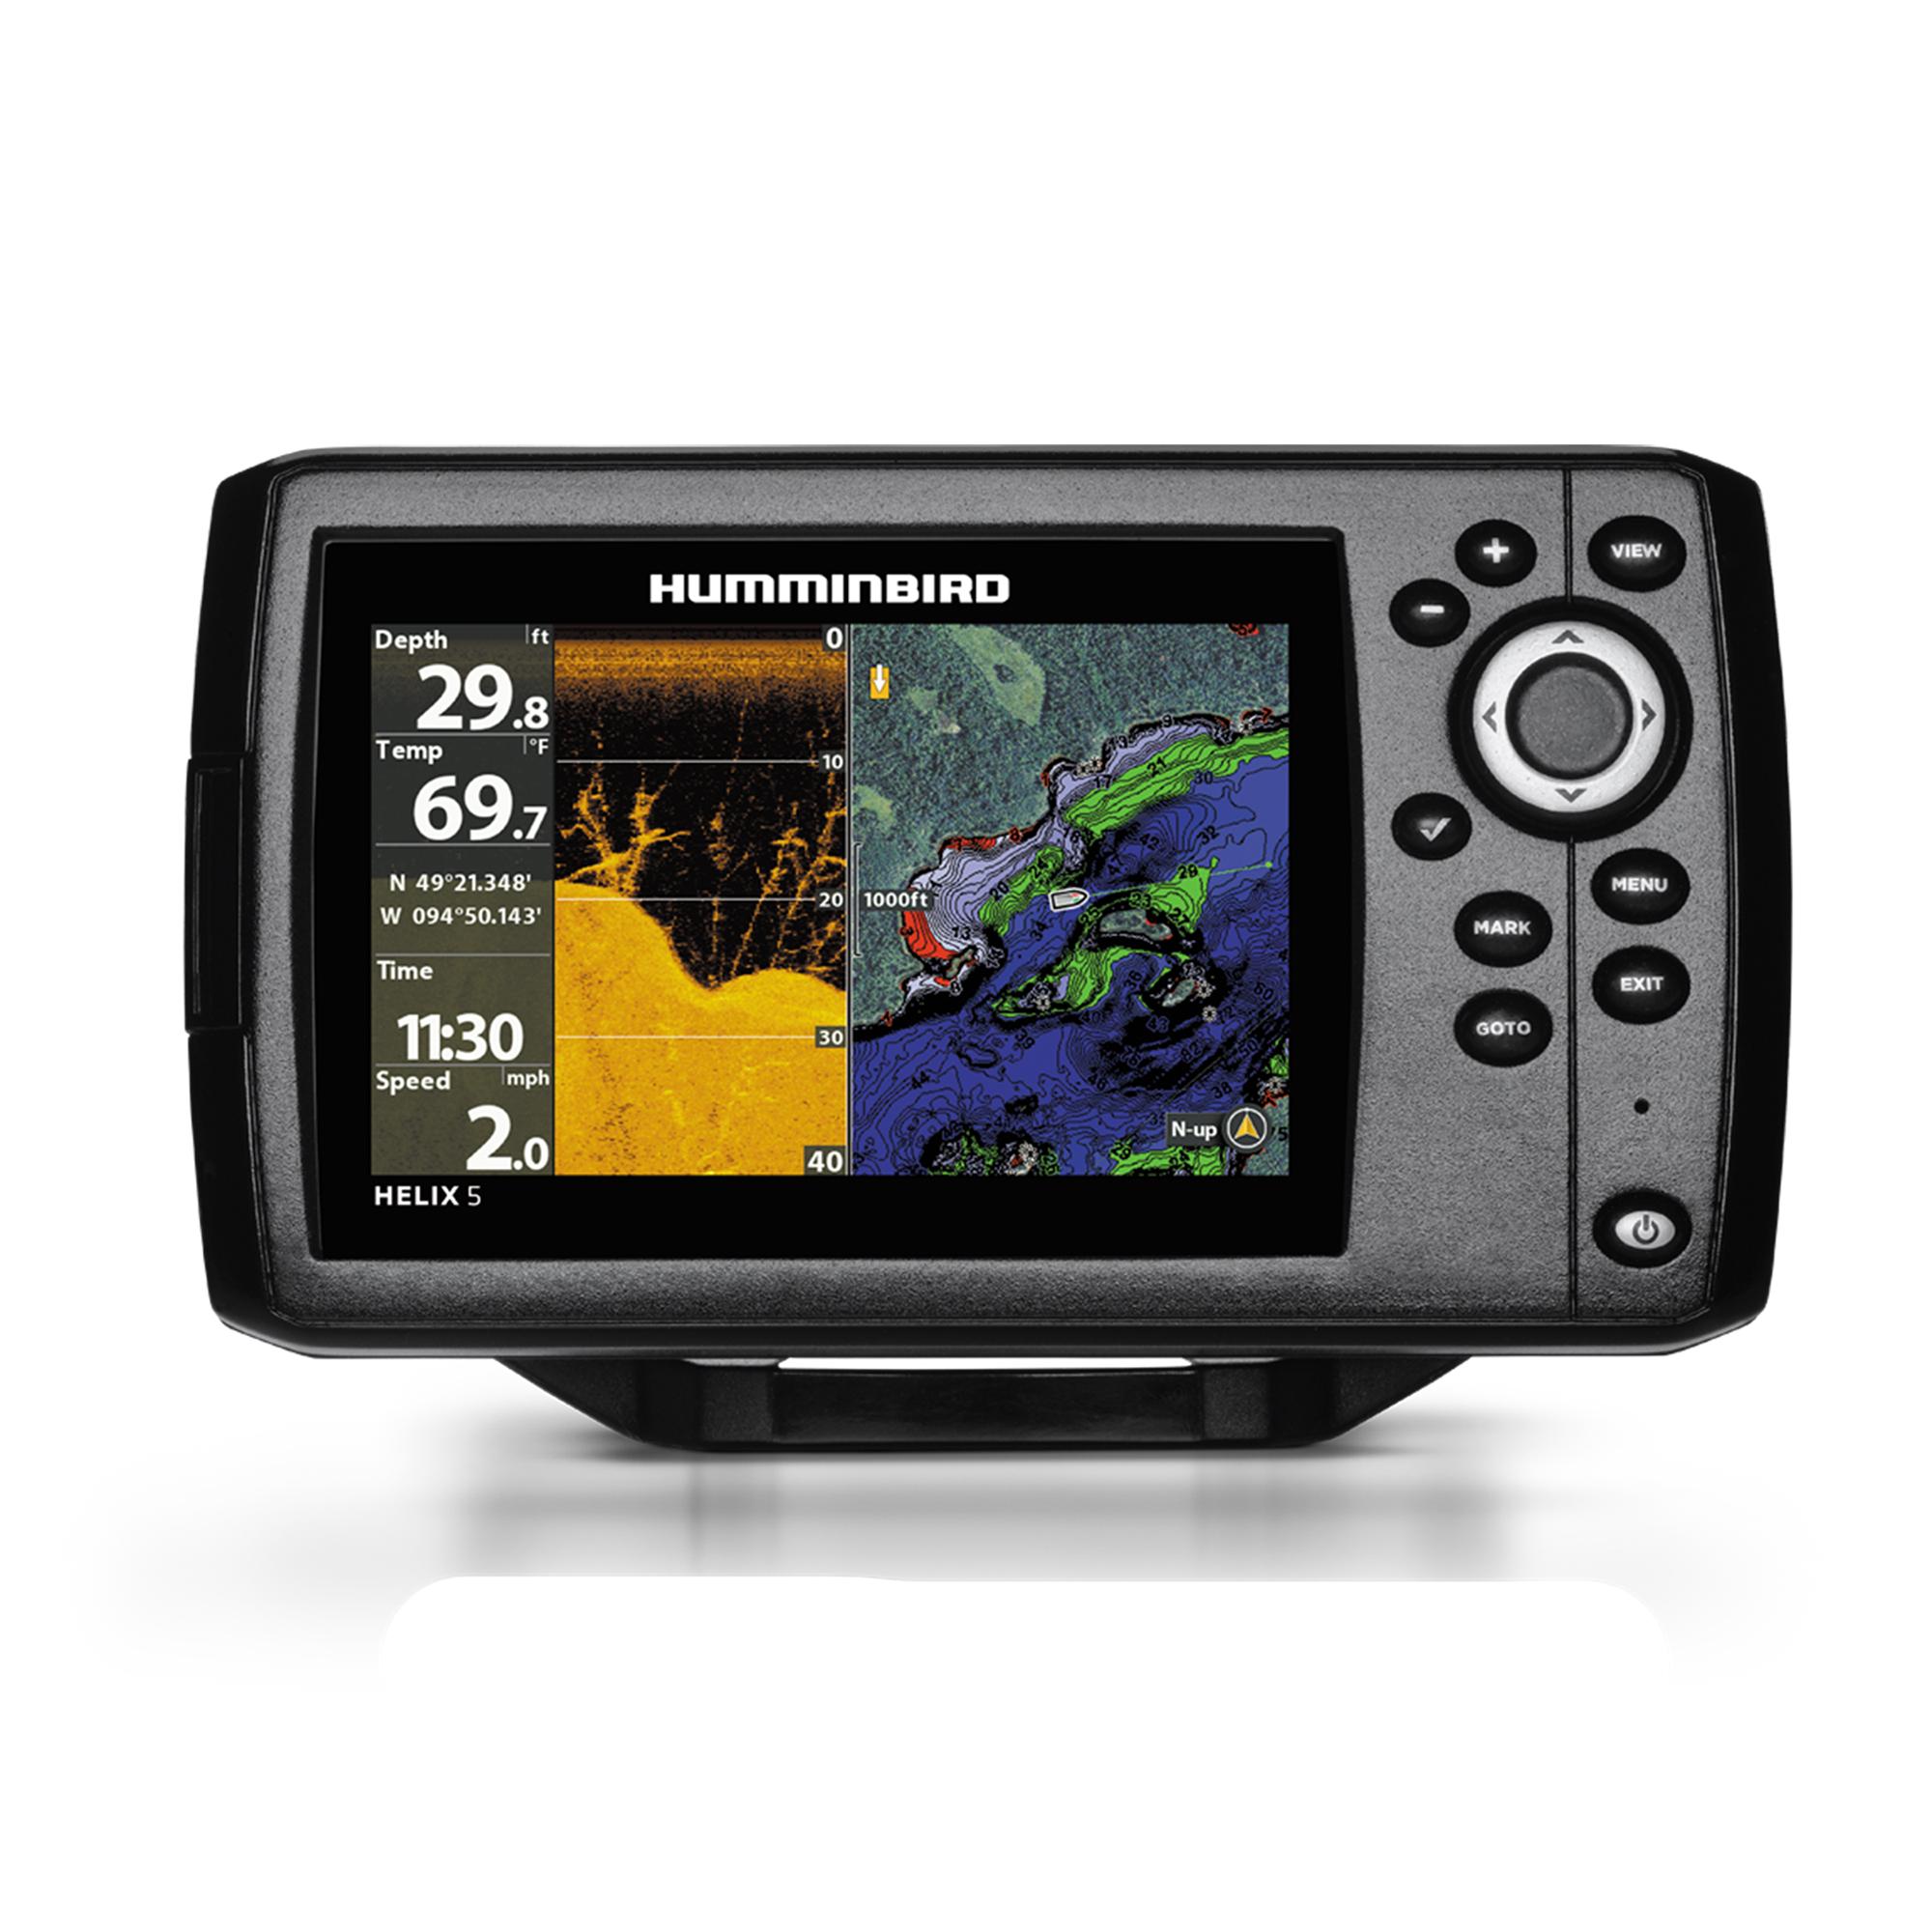 "Humminbird 410220-1NAV HELIX 5 CHIRP DI GPS G2 Sonar Fishfinder & Chartplotter with Down Imaging, Navionics & 5"" Display"